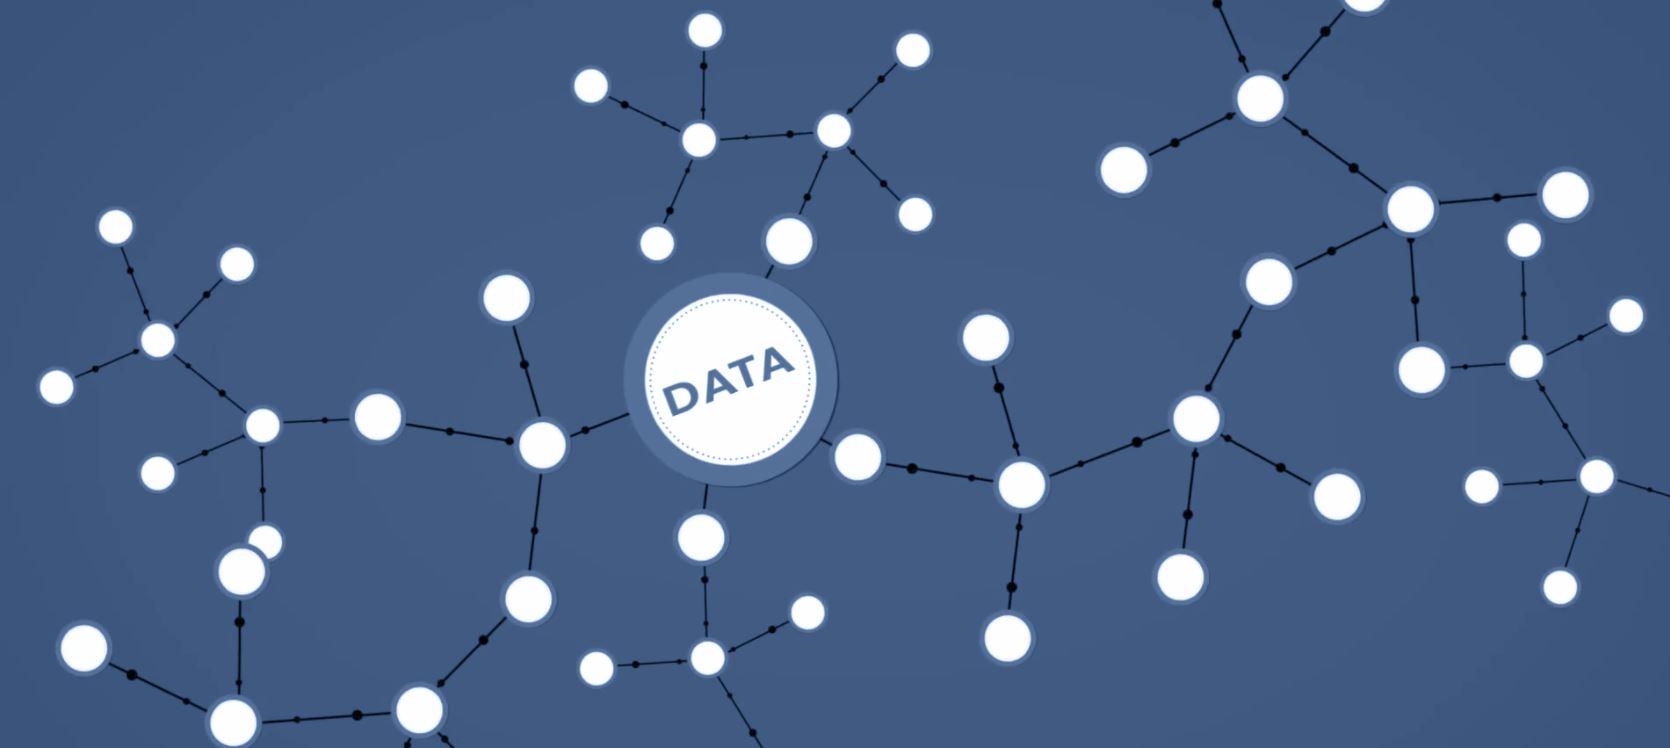 Exploring DATA with BI